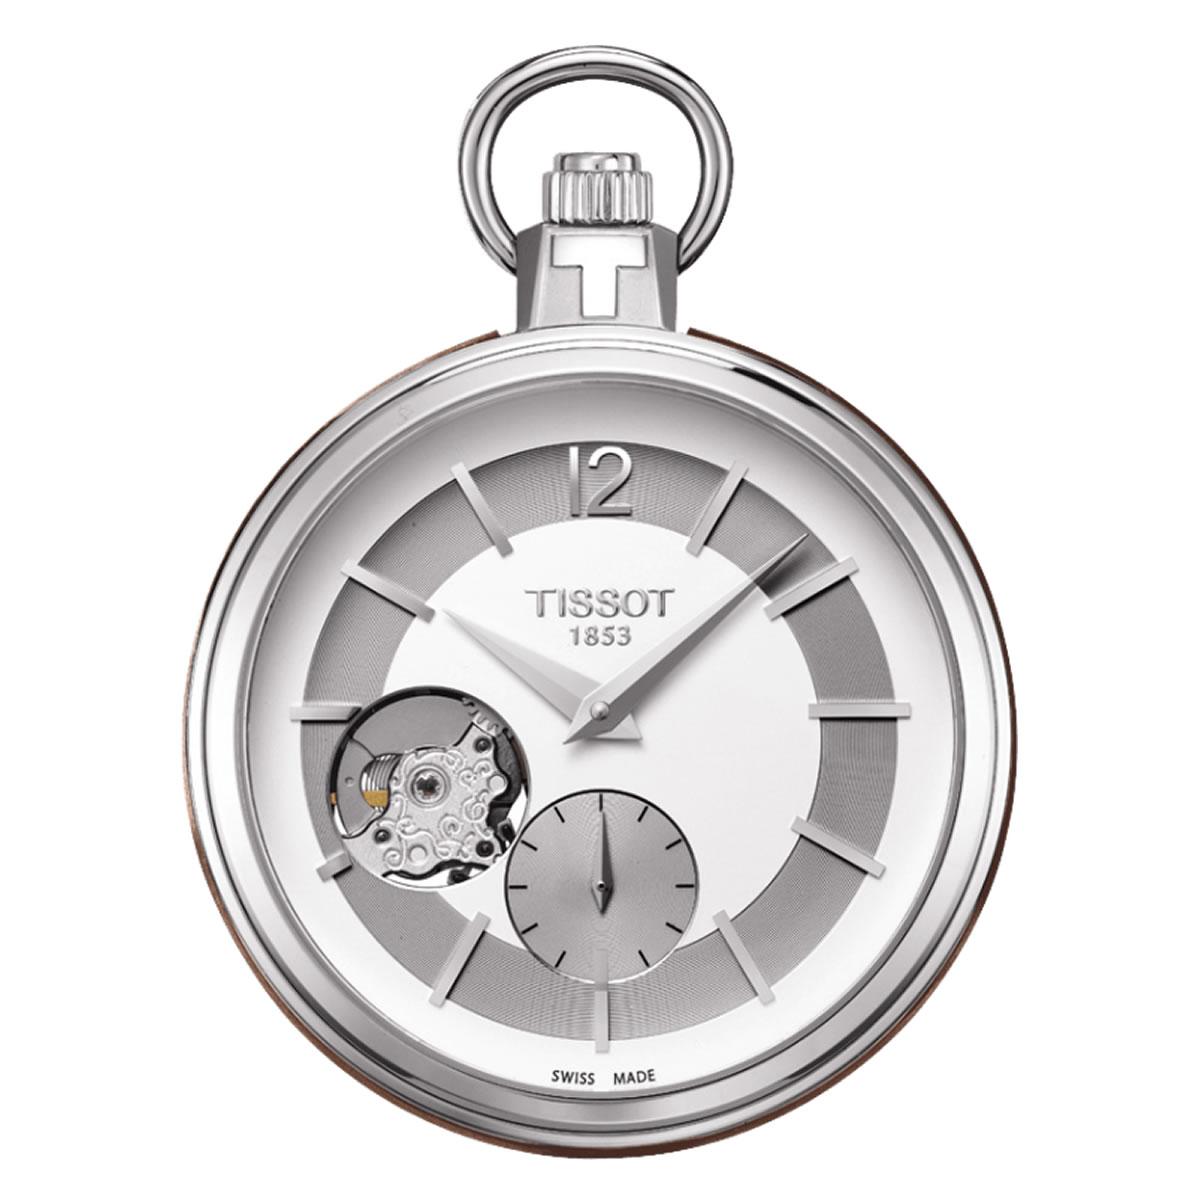 TISSOT/ティソ/オープンハート/ブラウンレザー/T854.405.19.037.00 懐中時計